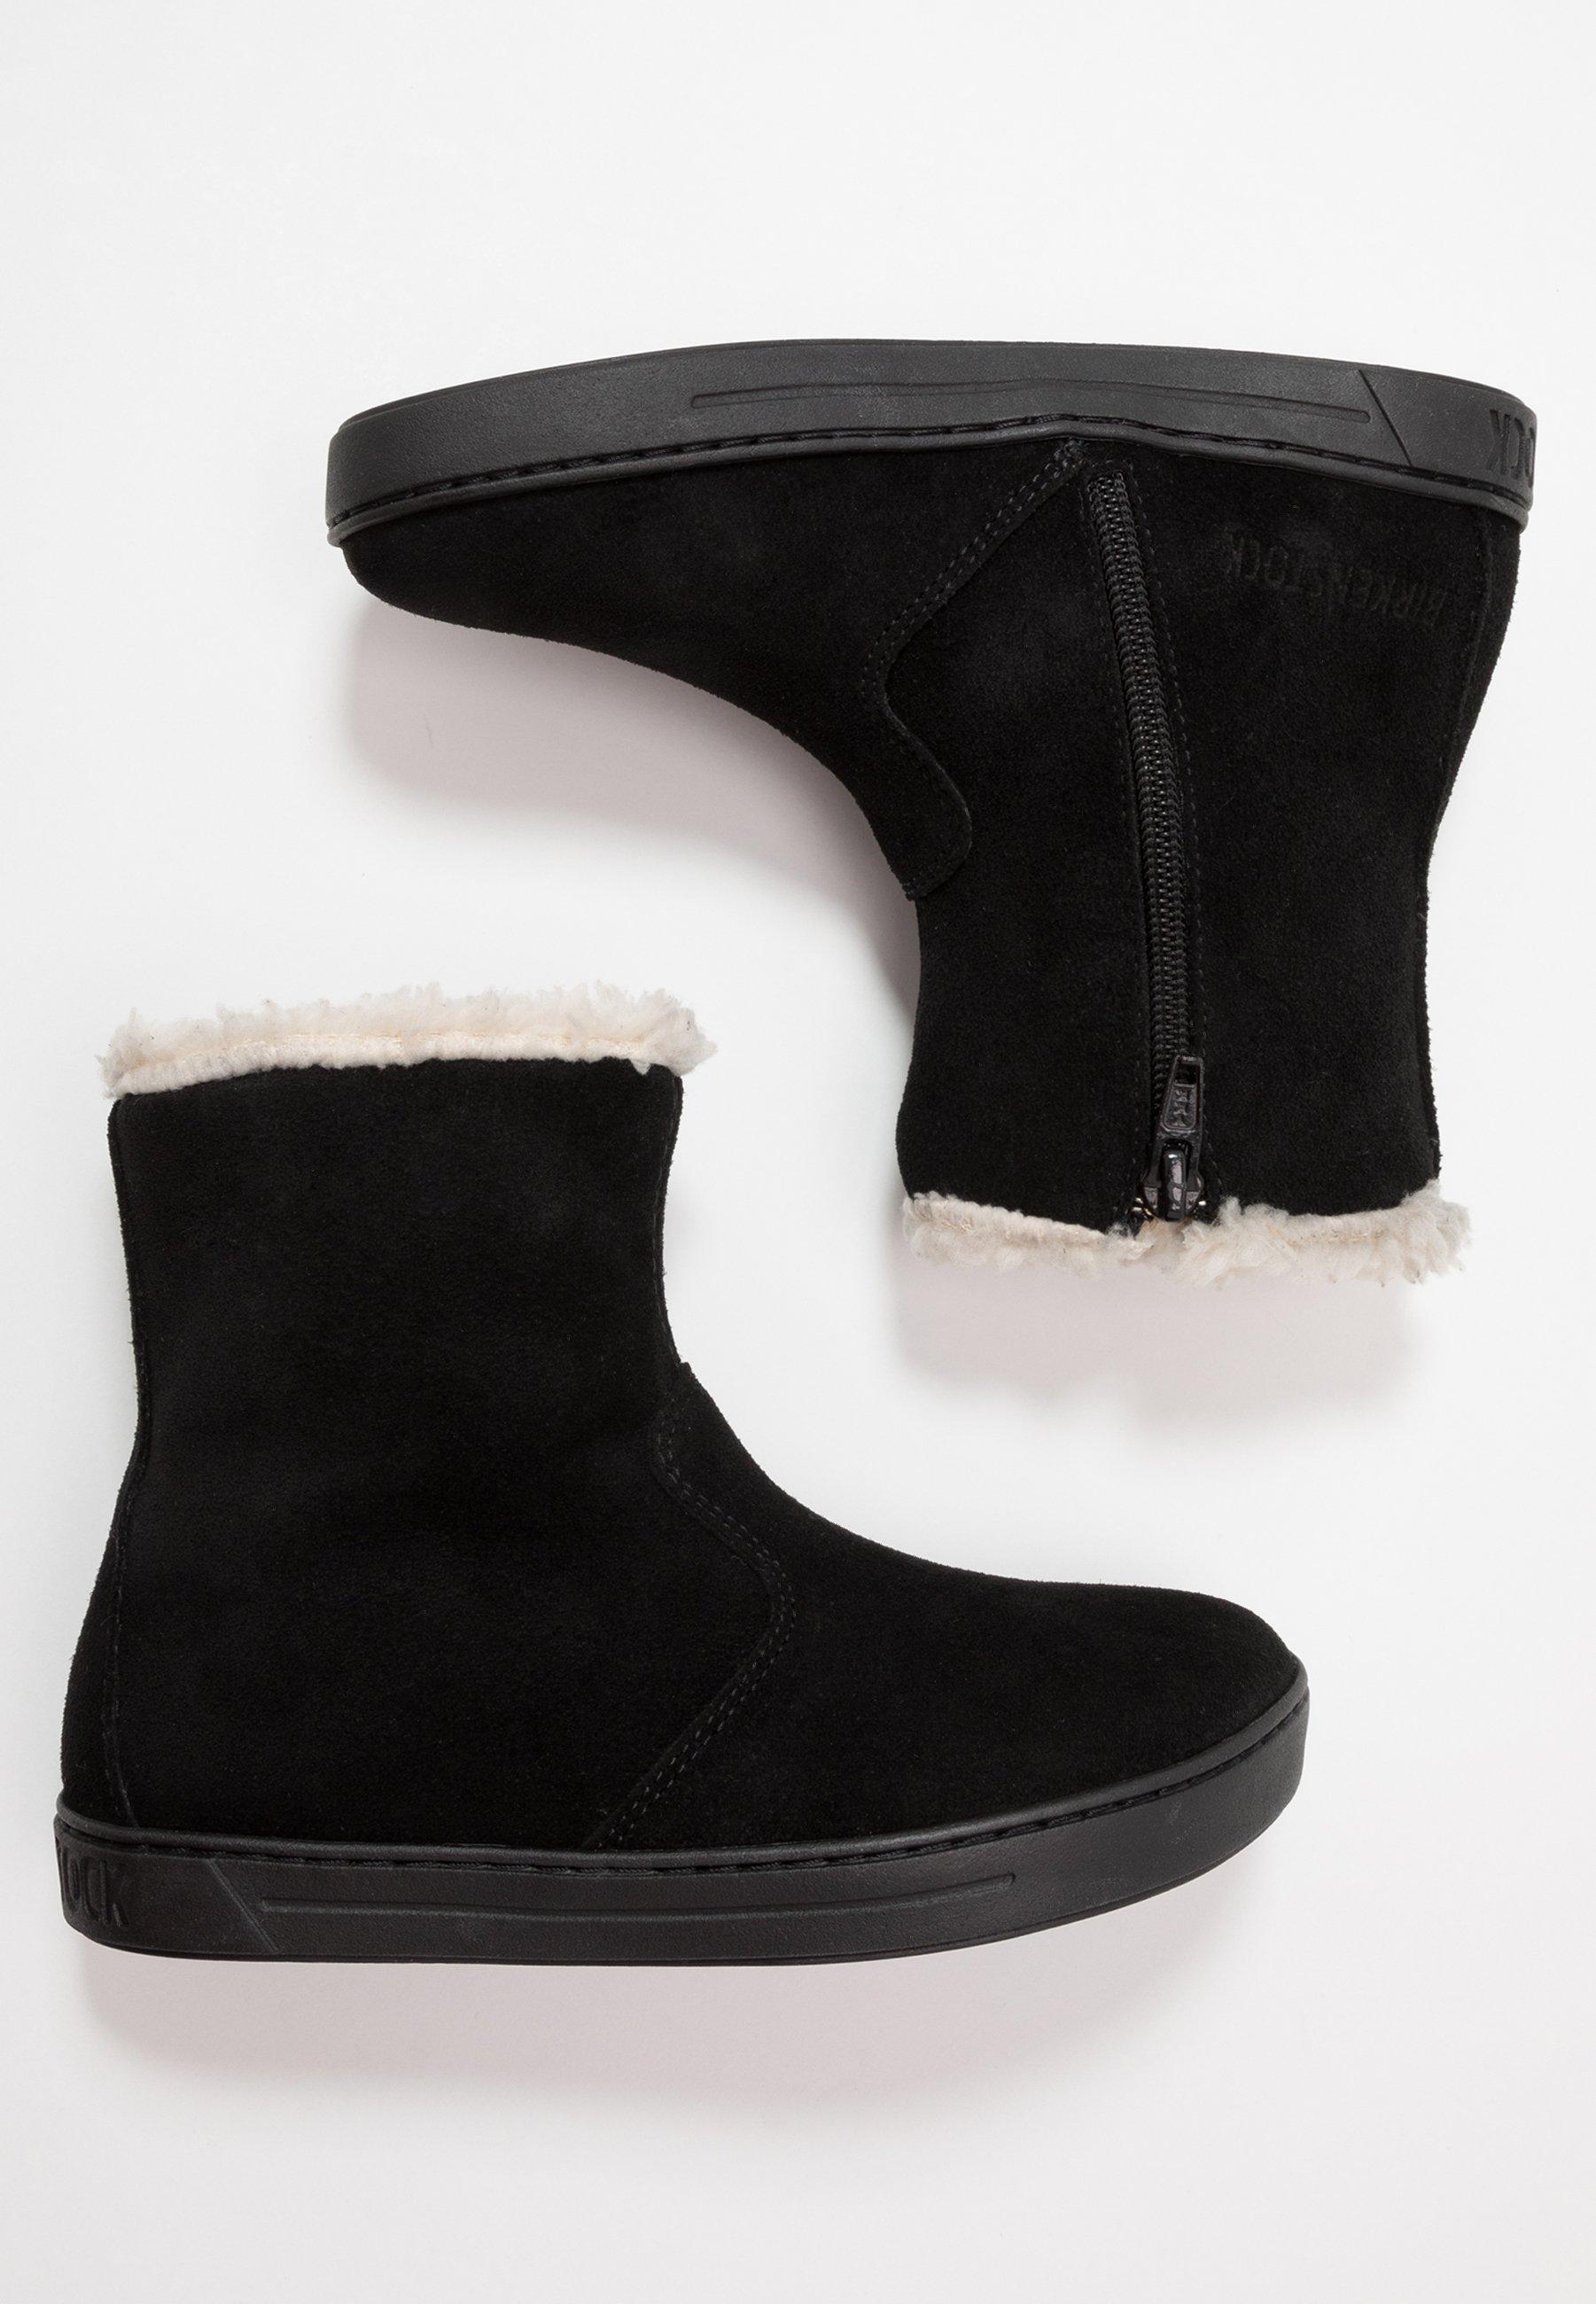 2013 Cheapest Birkenstock LILLE - Winter boots - black | kids shoes 2020 FXrKx